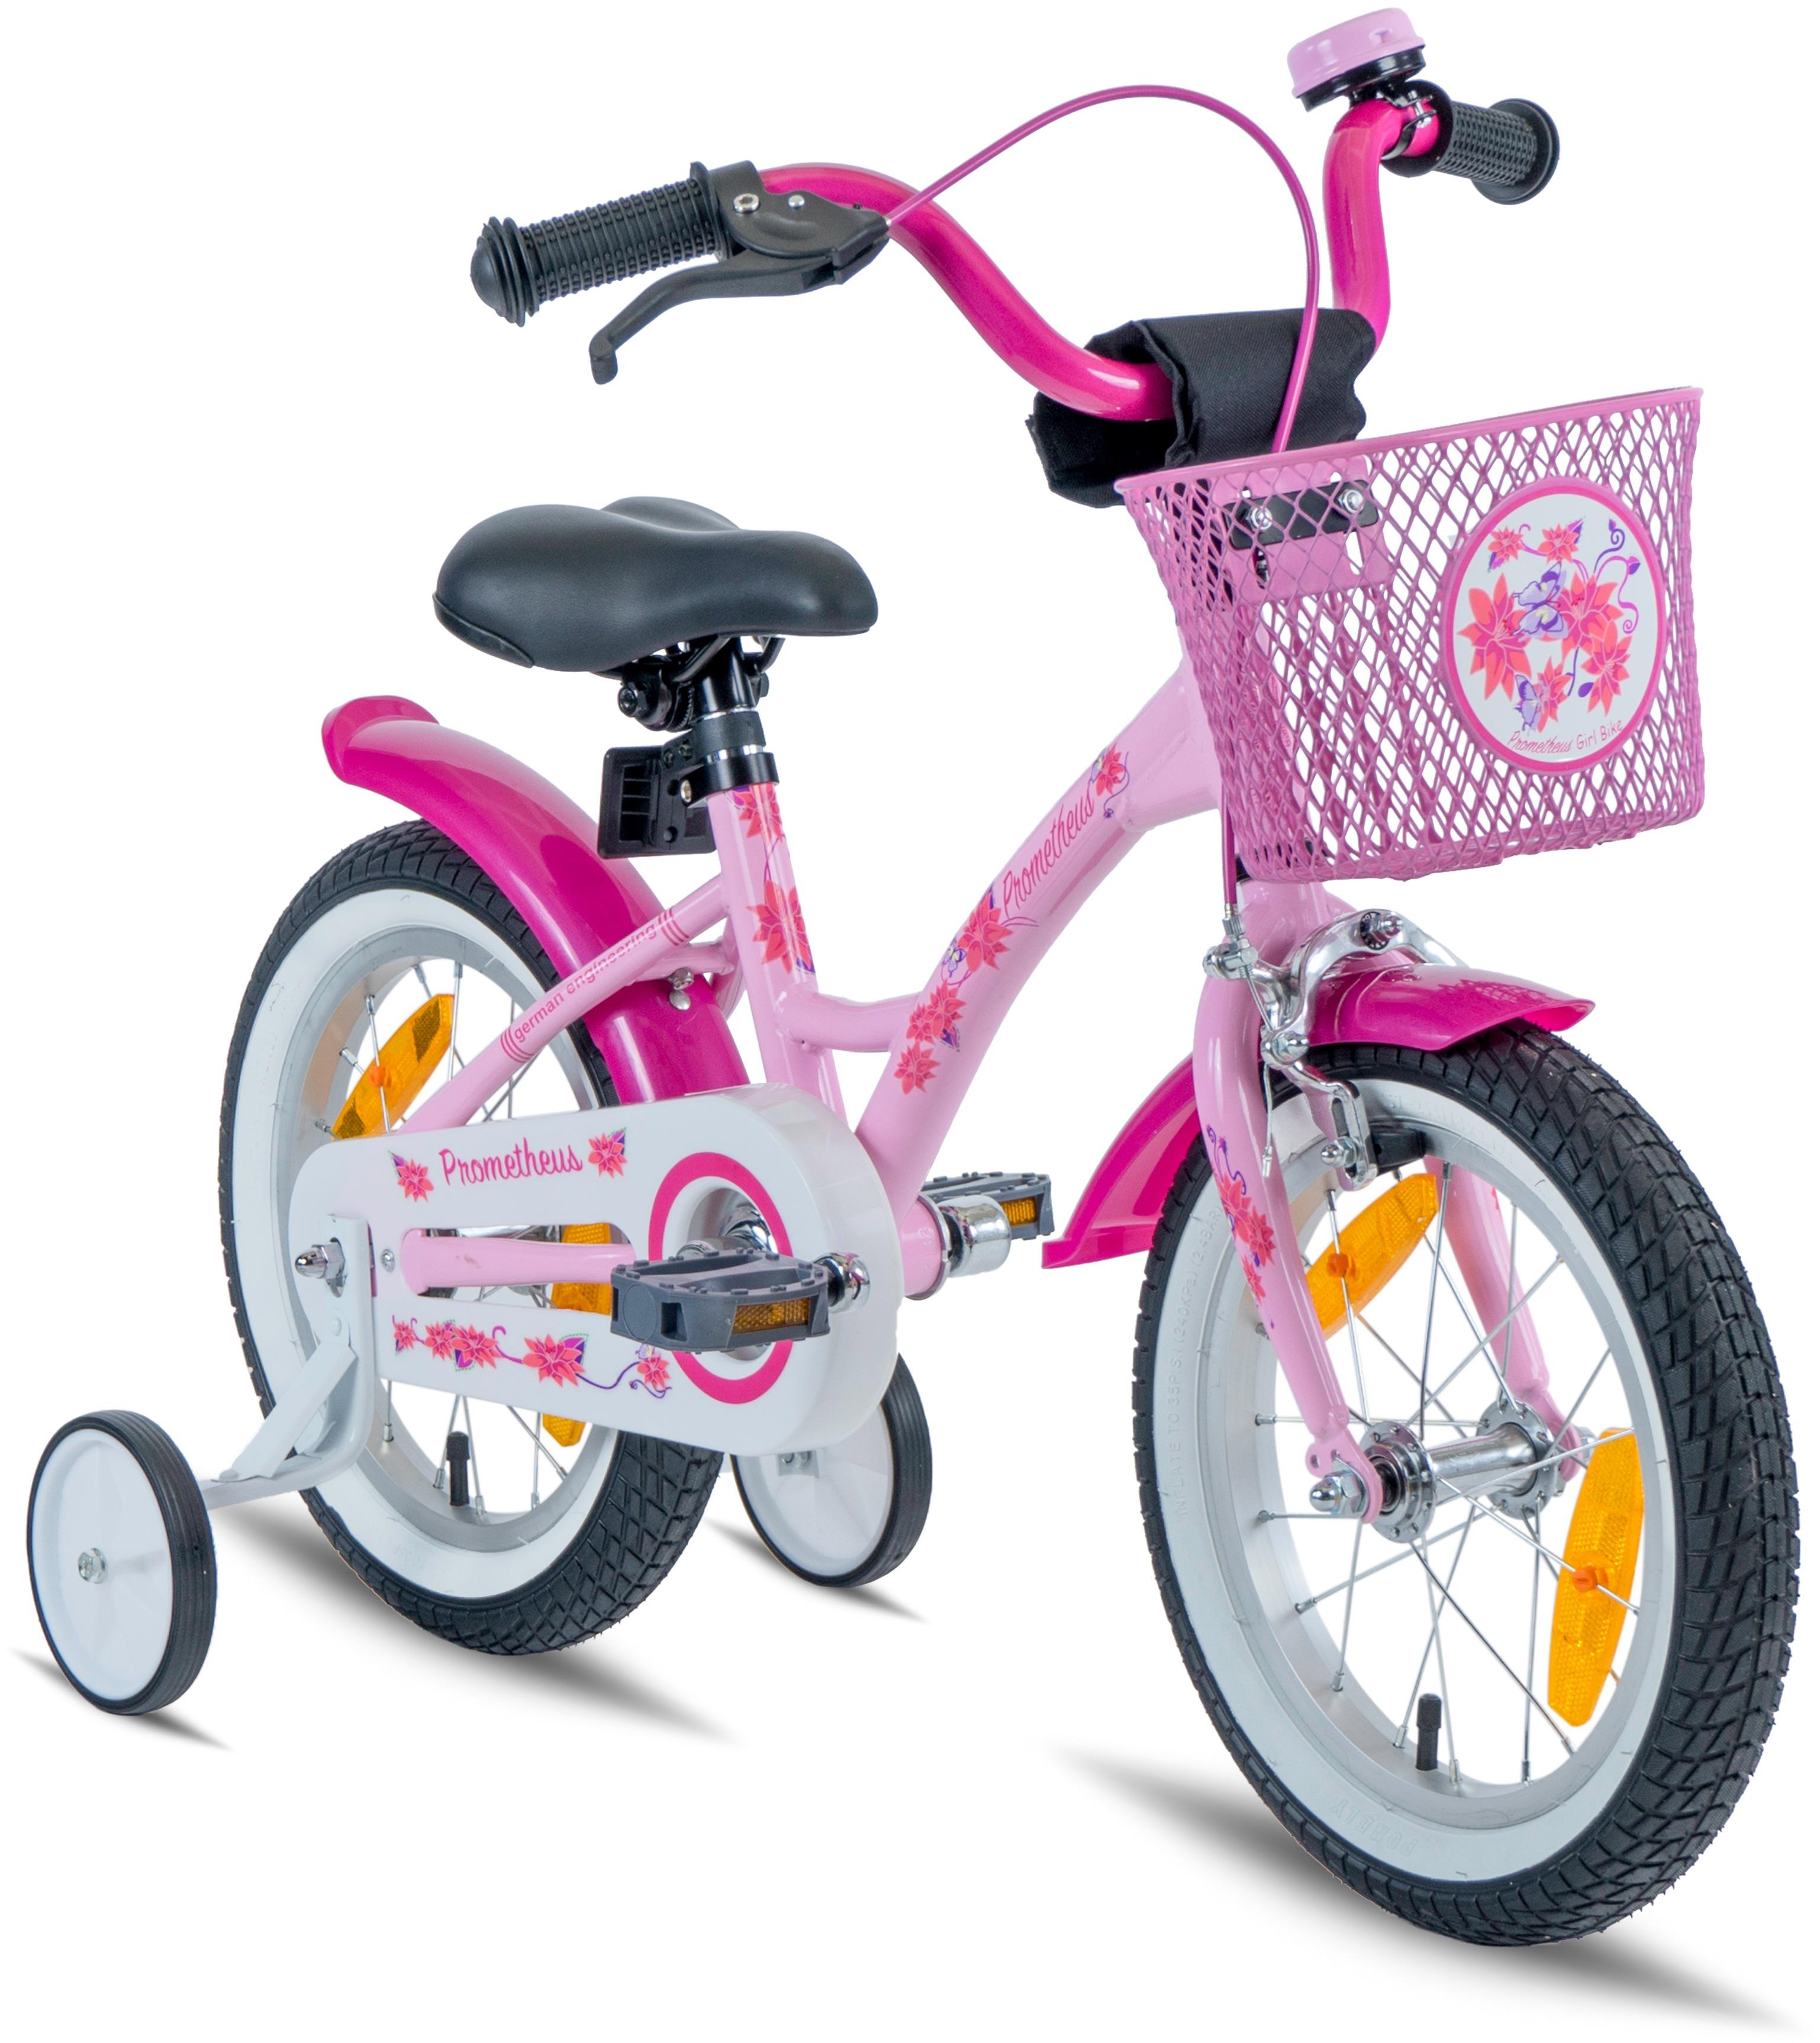 PROMETHEUS BICYCLES Kinderfahrrad Hawk rosa Kinder Kinderfahrräder Fahrräder Zubehör Fahrrad